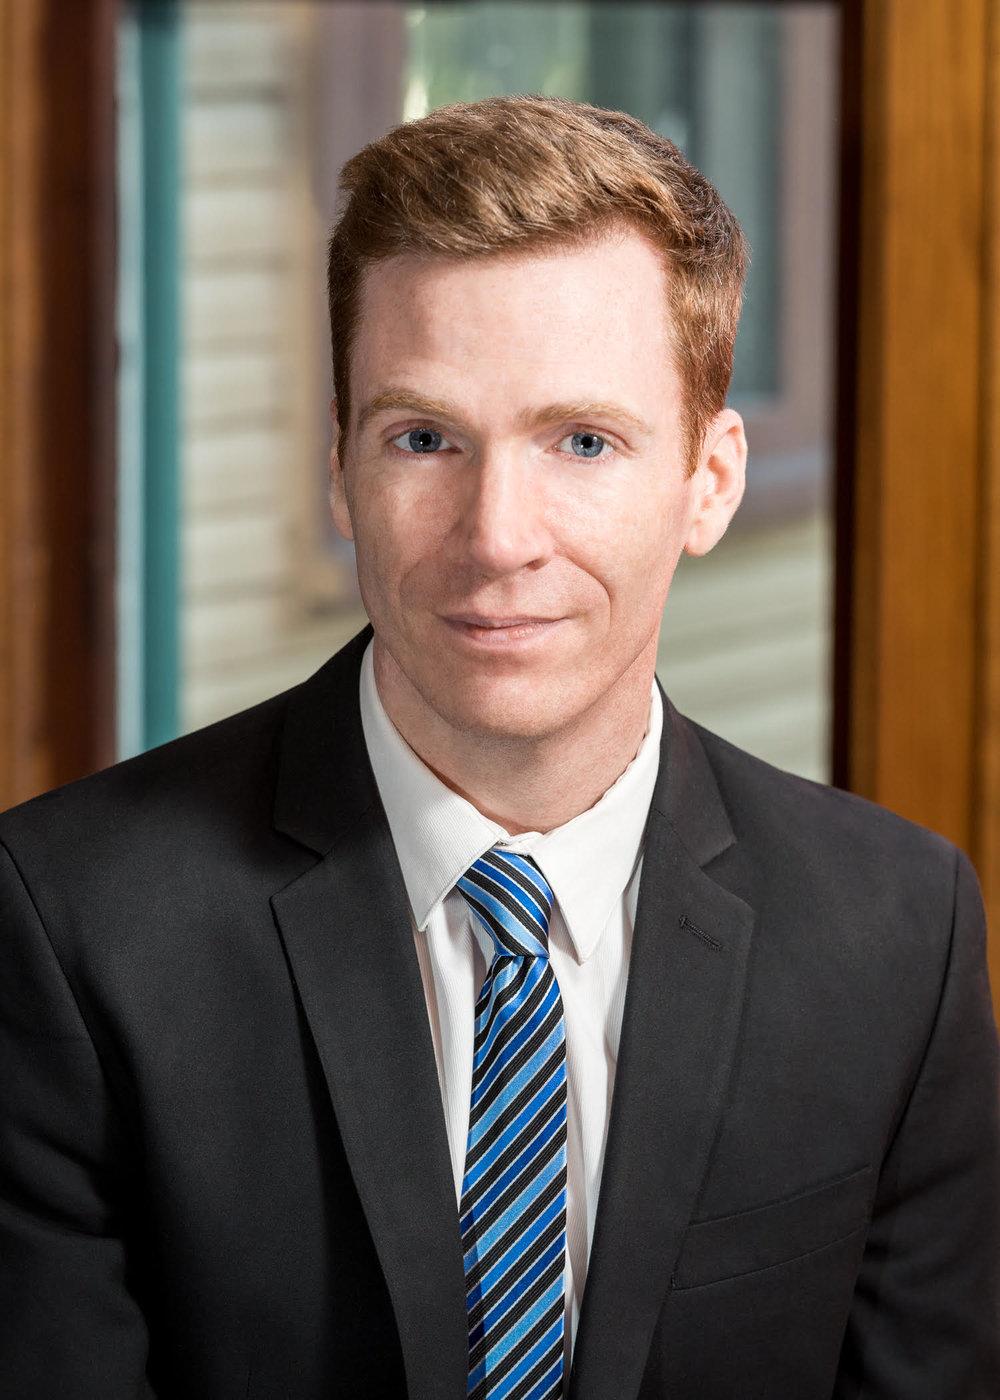 Michael Nye